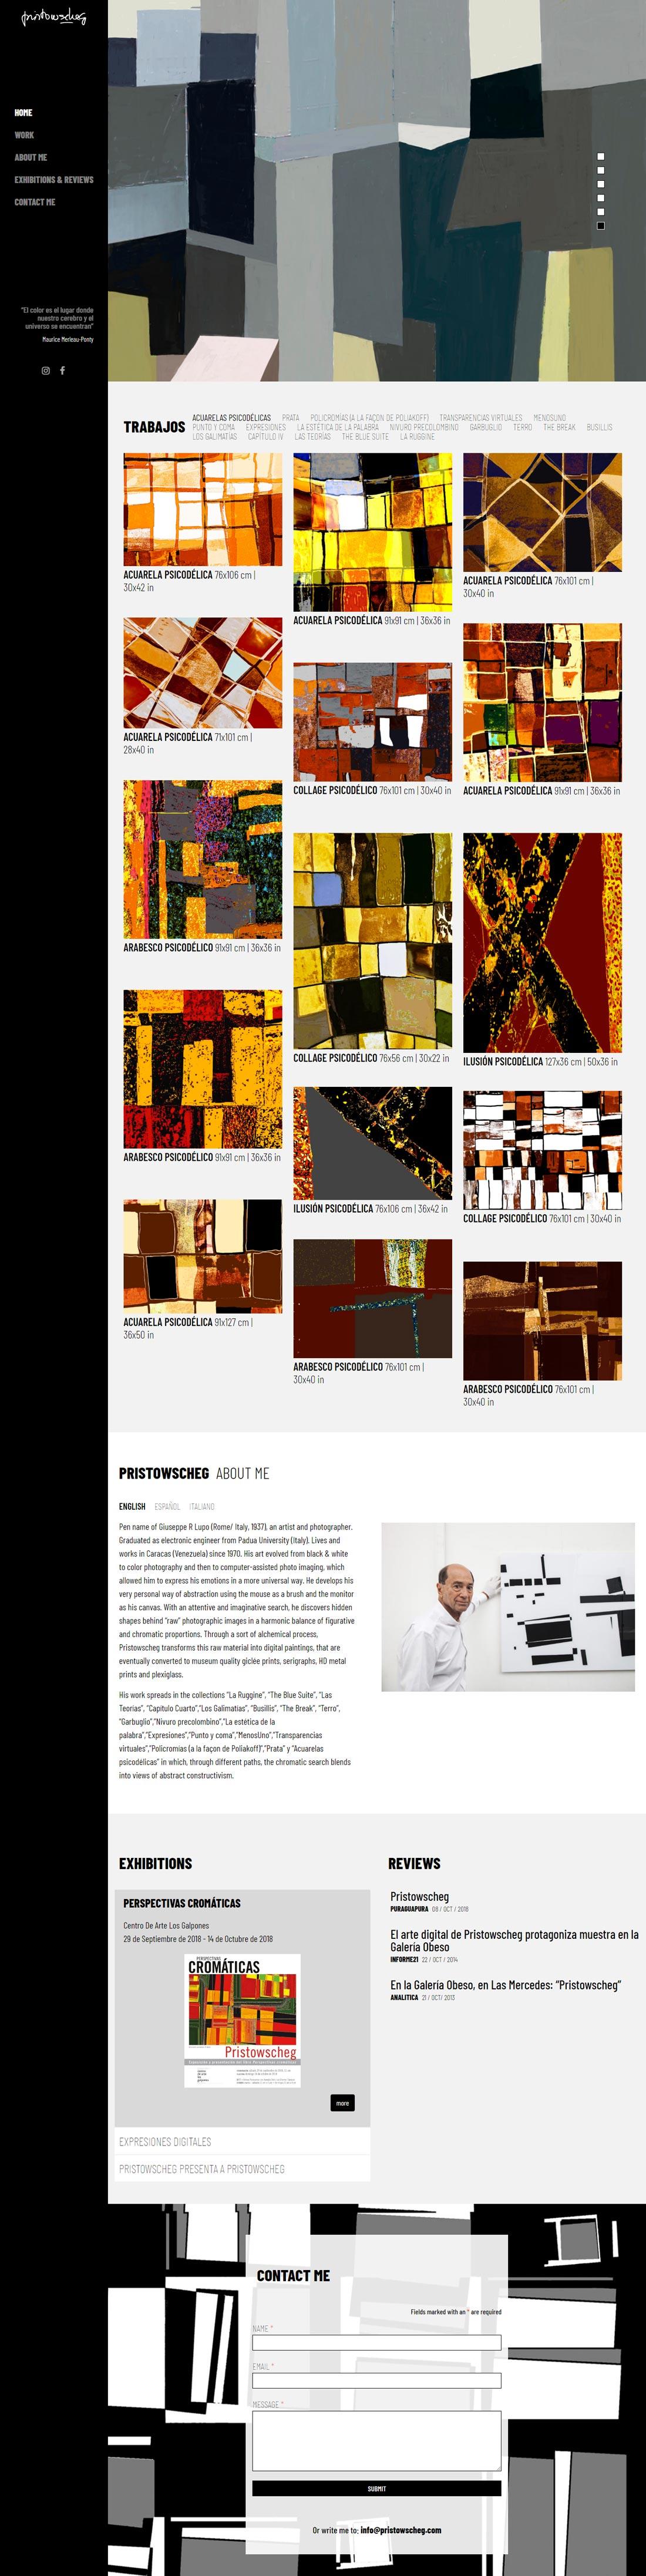 Pristowscheg | Portafolio de Pristowscheg, artista plástico digital. Sitio con scroll infinito desarrollado para WordPress, en ingles con mansory, bootstrap y sass.